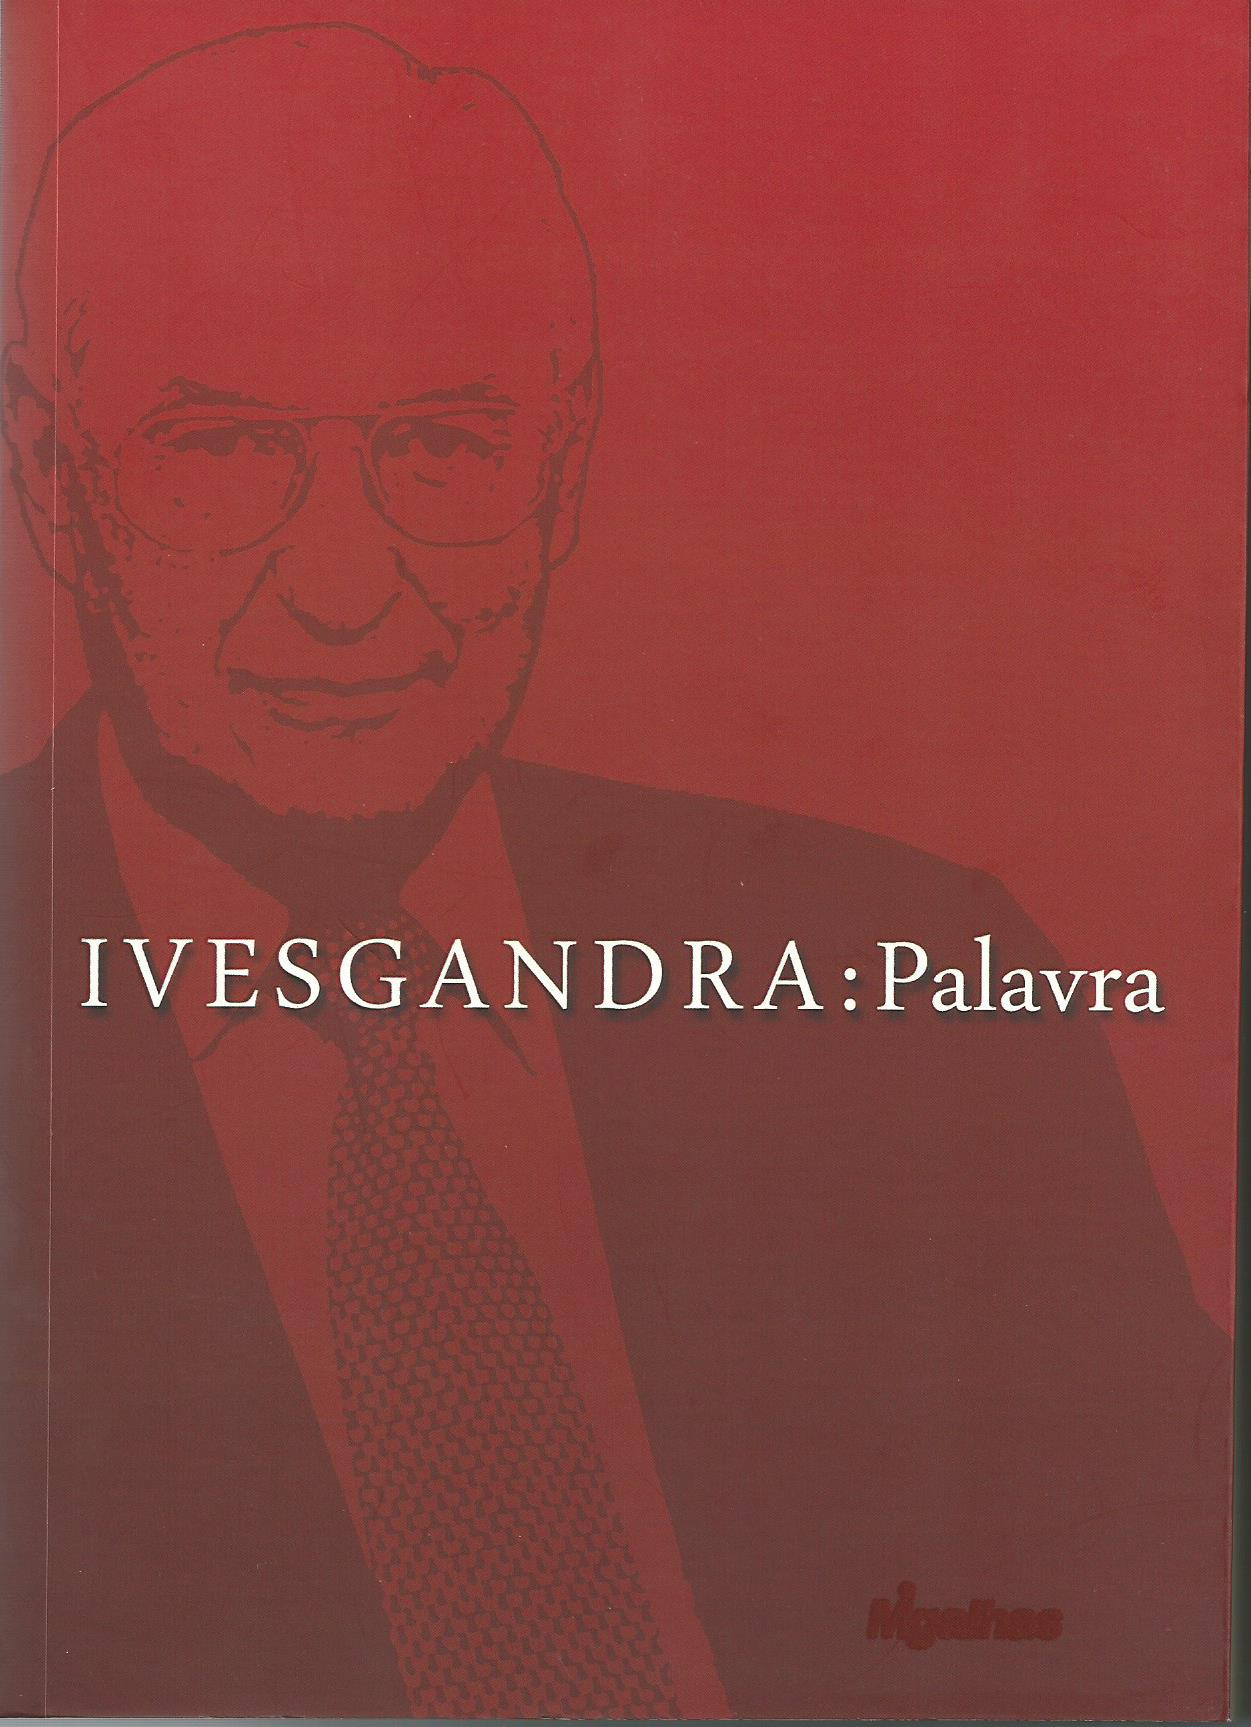 Ives Gandra: palavra